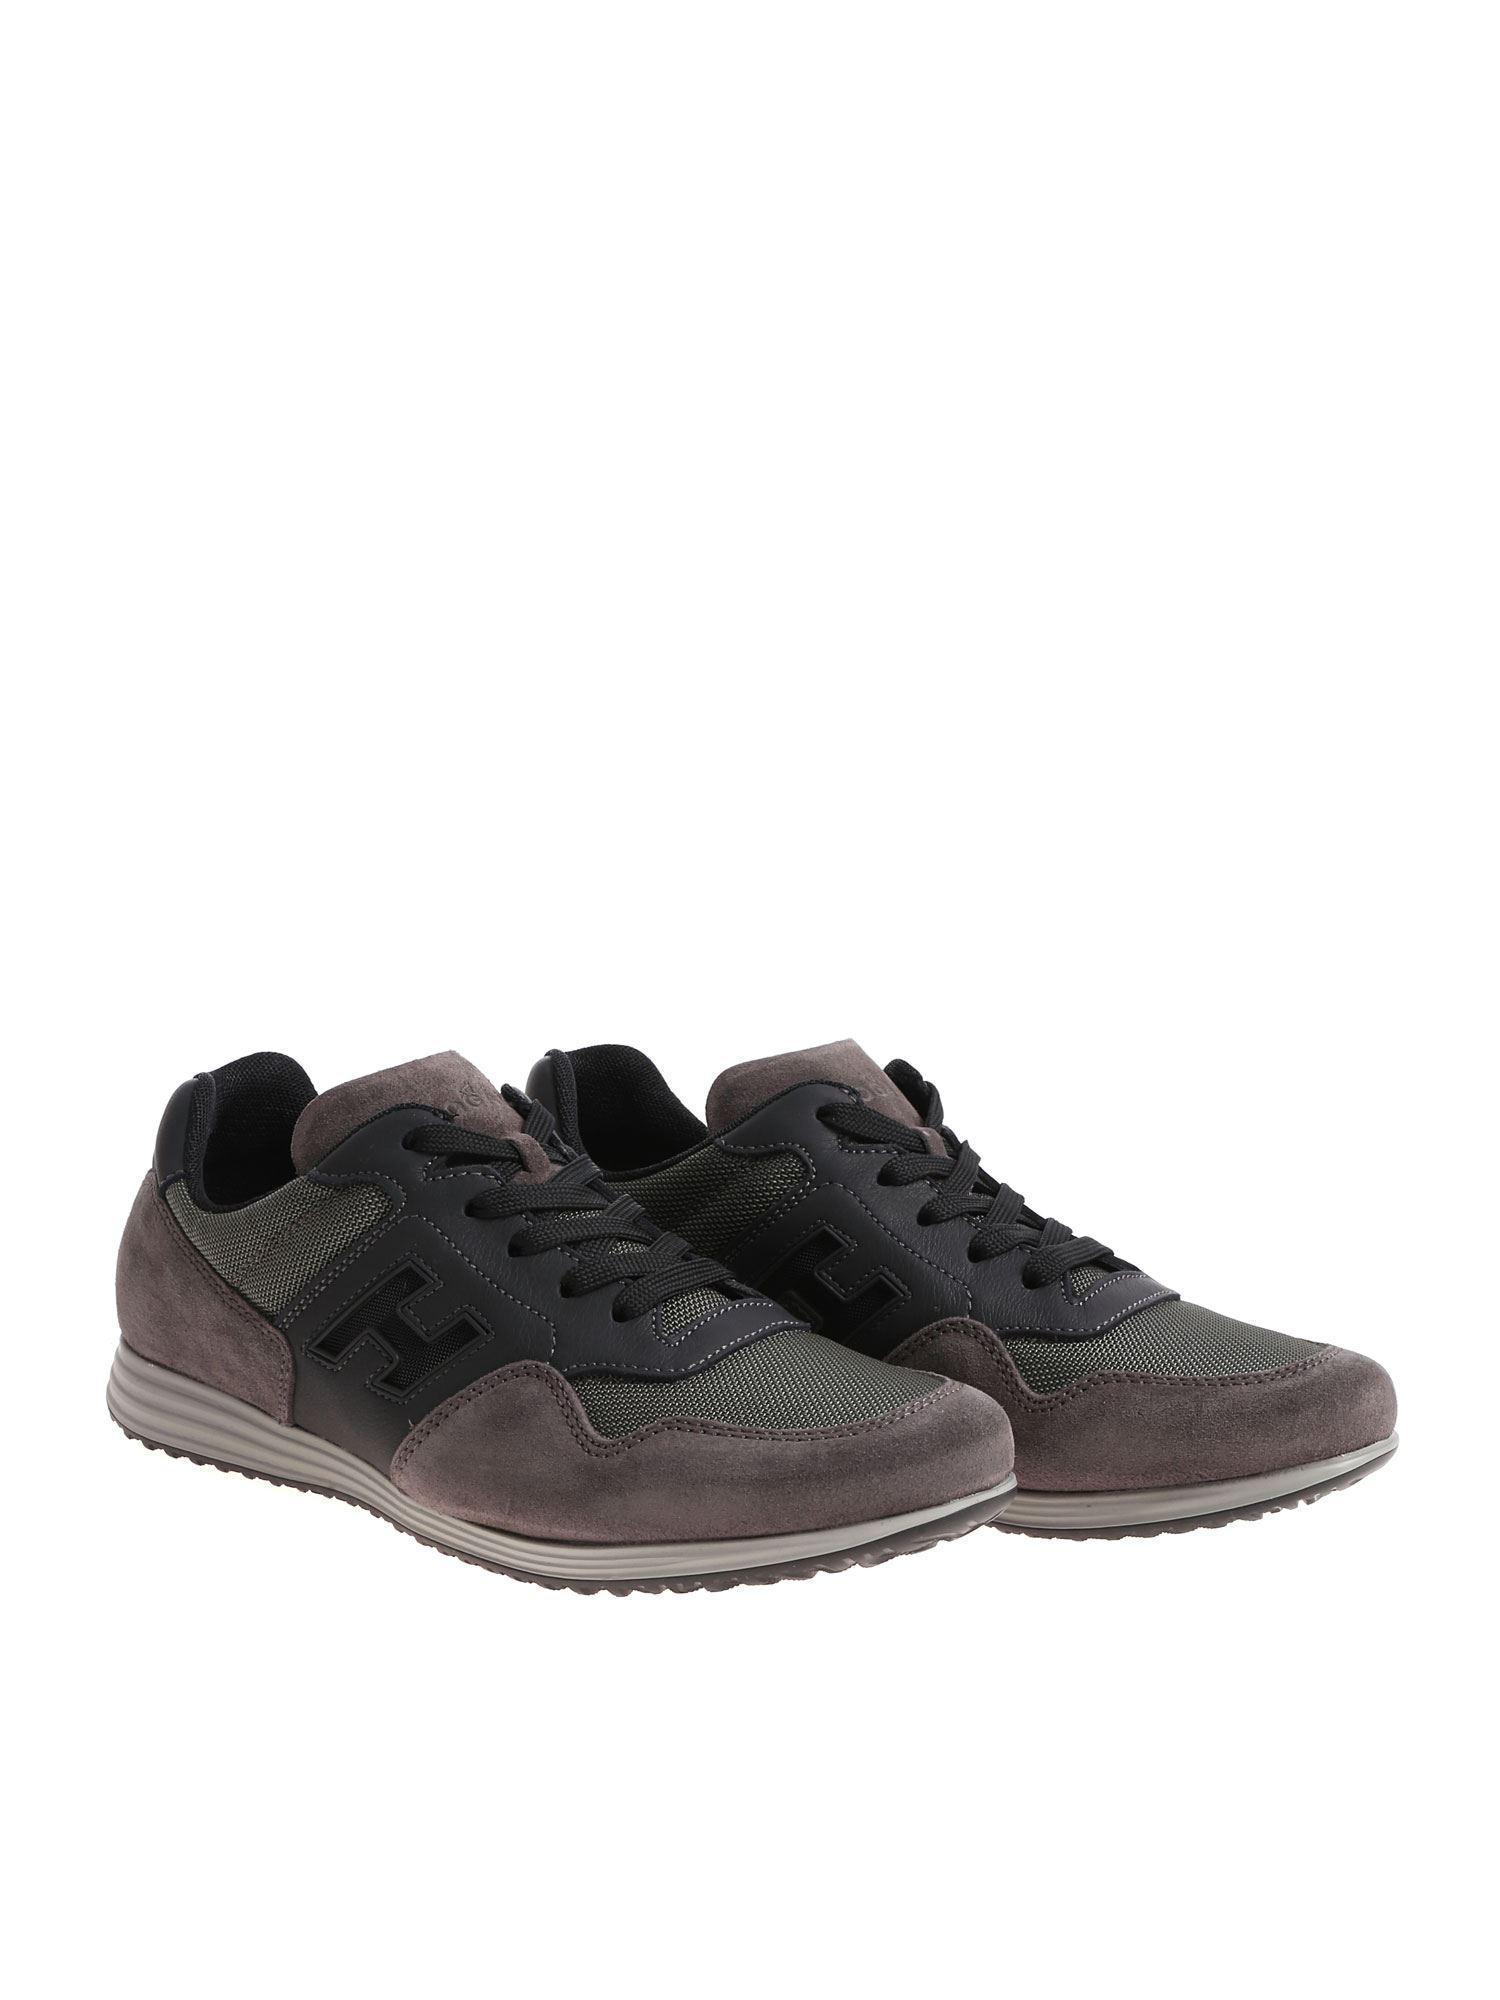 e33b99dbdf9 Lyst - Hogan H205 Olympia X Grey Sneakers in Gray for Men